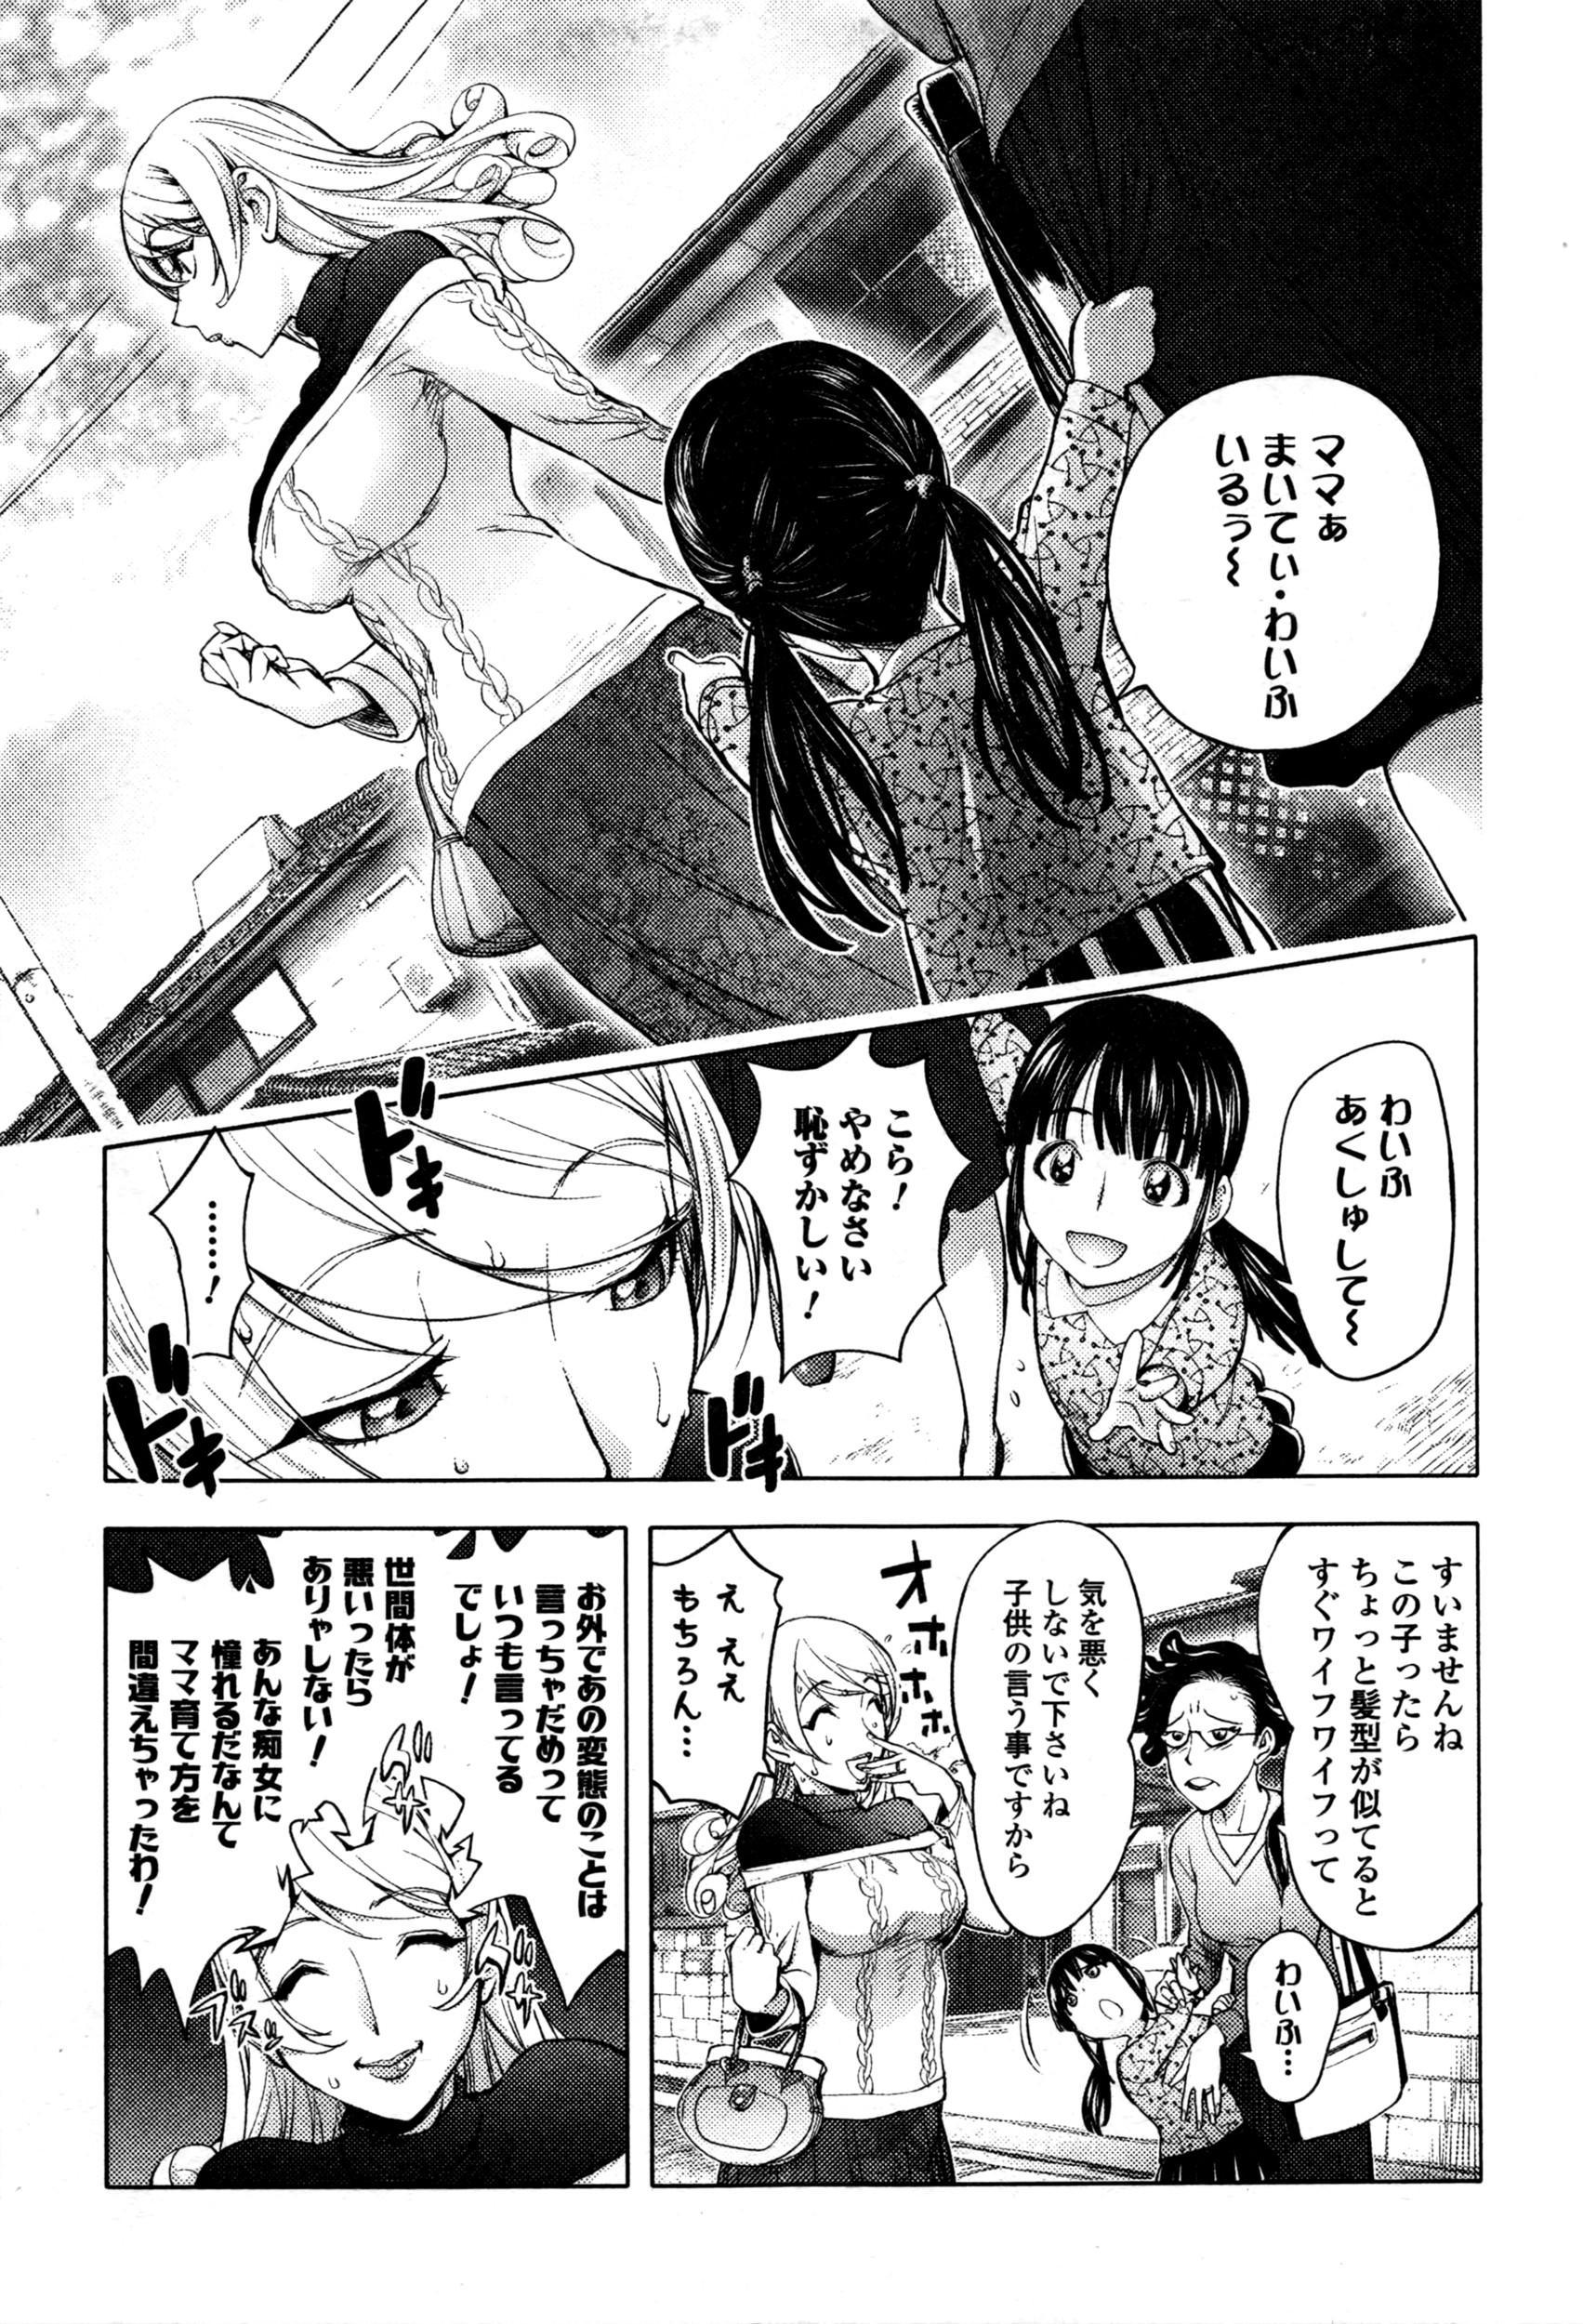 Comic JSCK Vol.3 2016-03 69